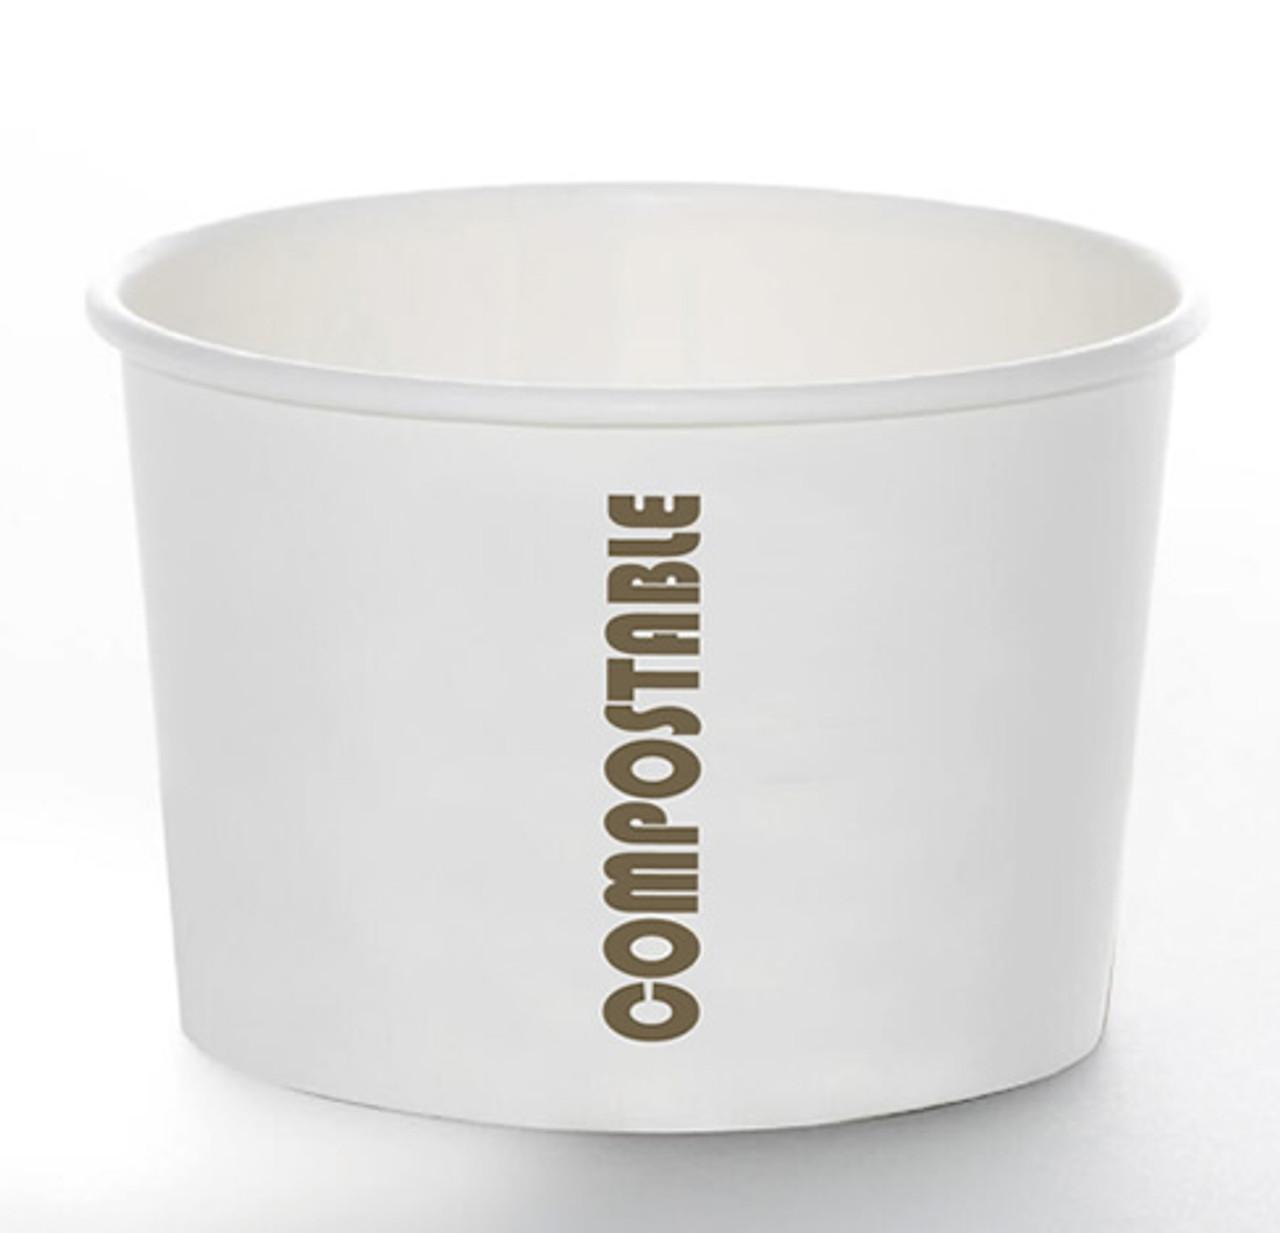 8oz Soup Cup Compostable Print™ Series